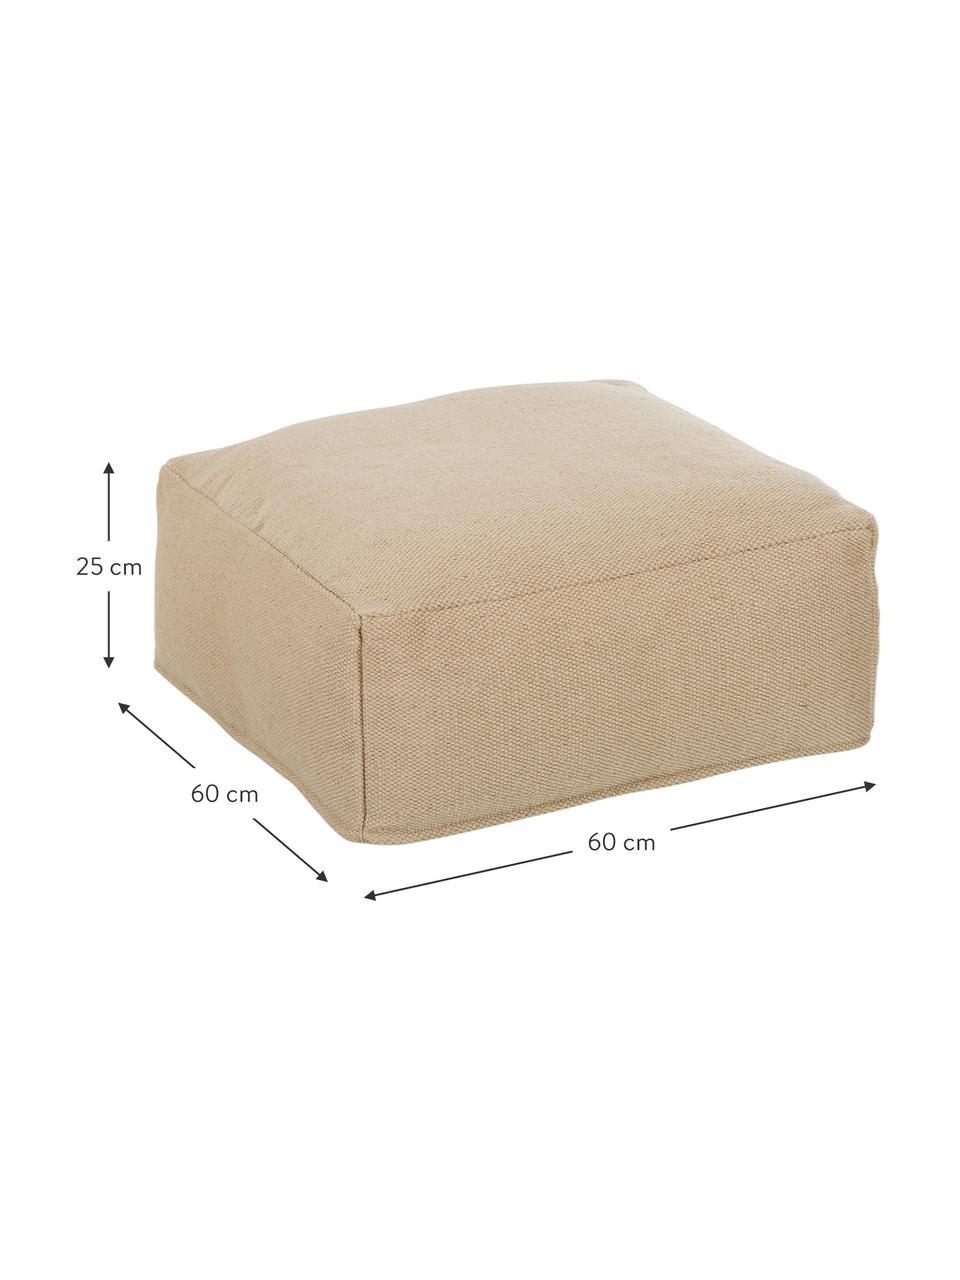 Cuscino da pavimento da interno-esterno Khela, Rivestimento: 100% poliestere riciclato, Beige, Larg. 60 x Alt. 25 cm